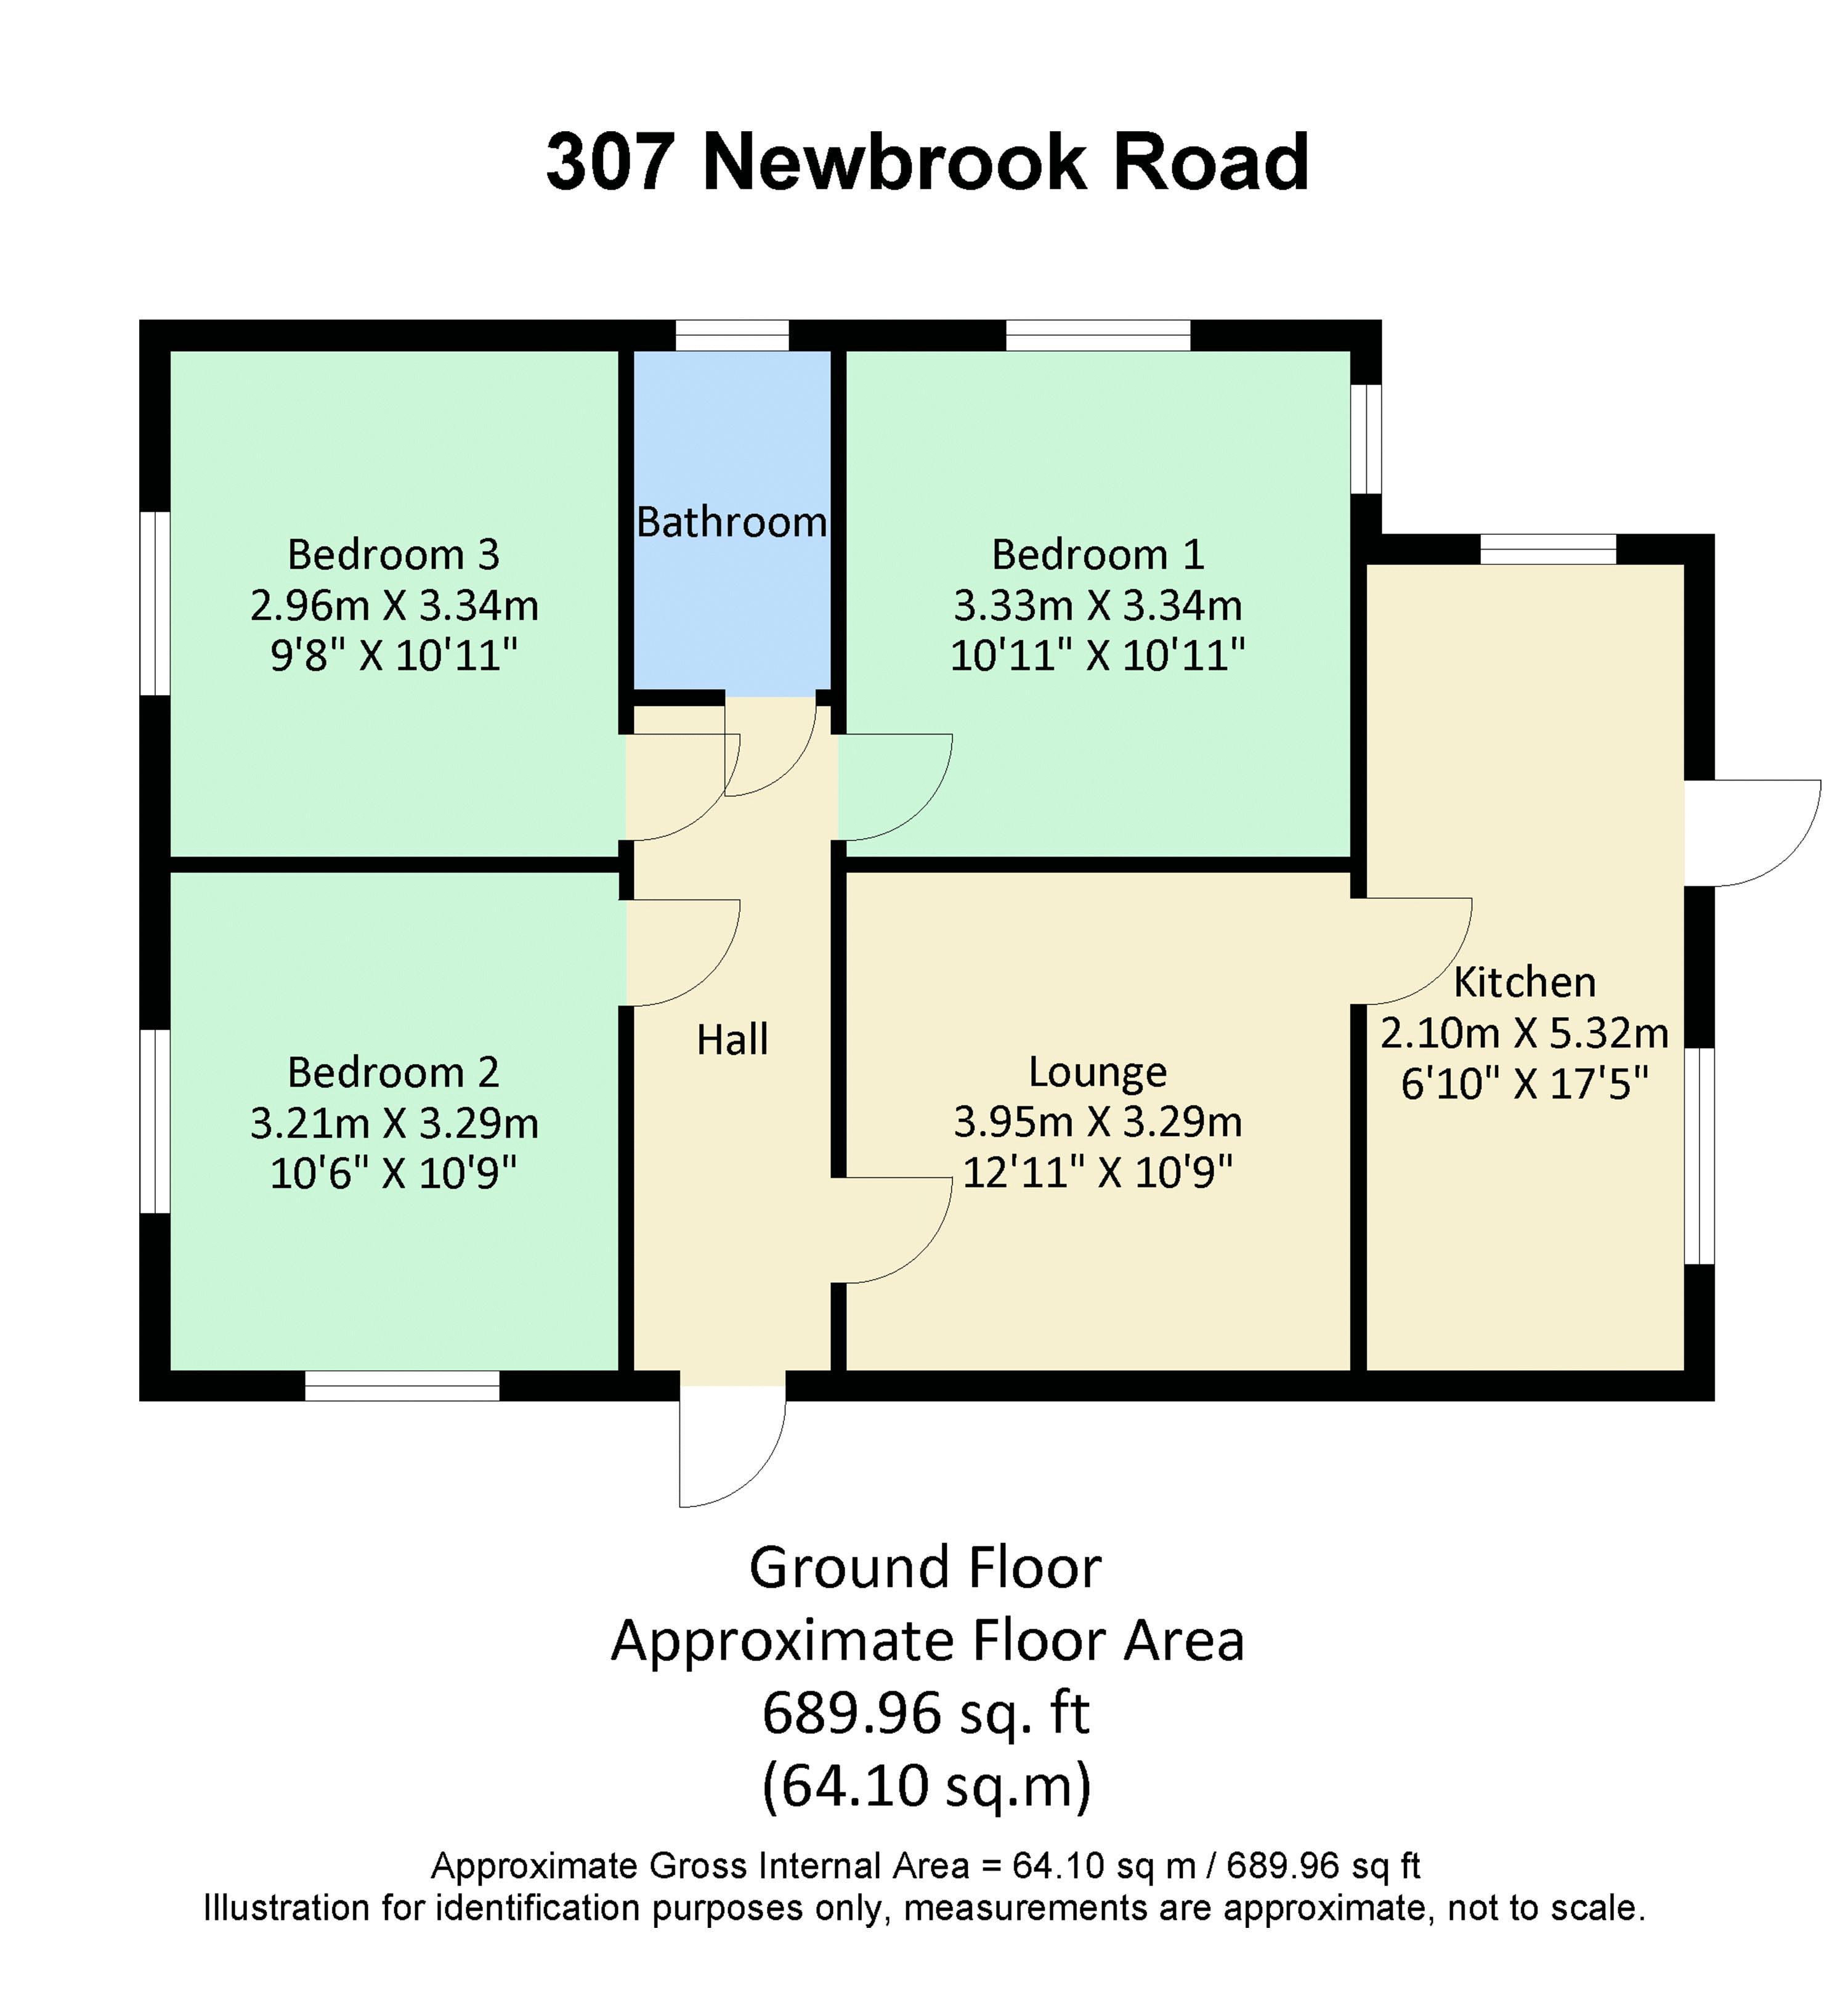 307 Newbrook Road